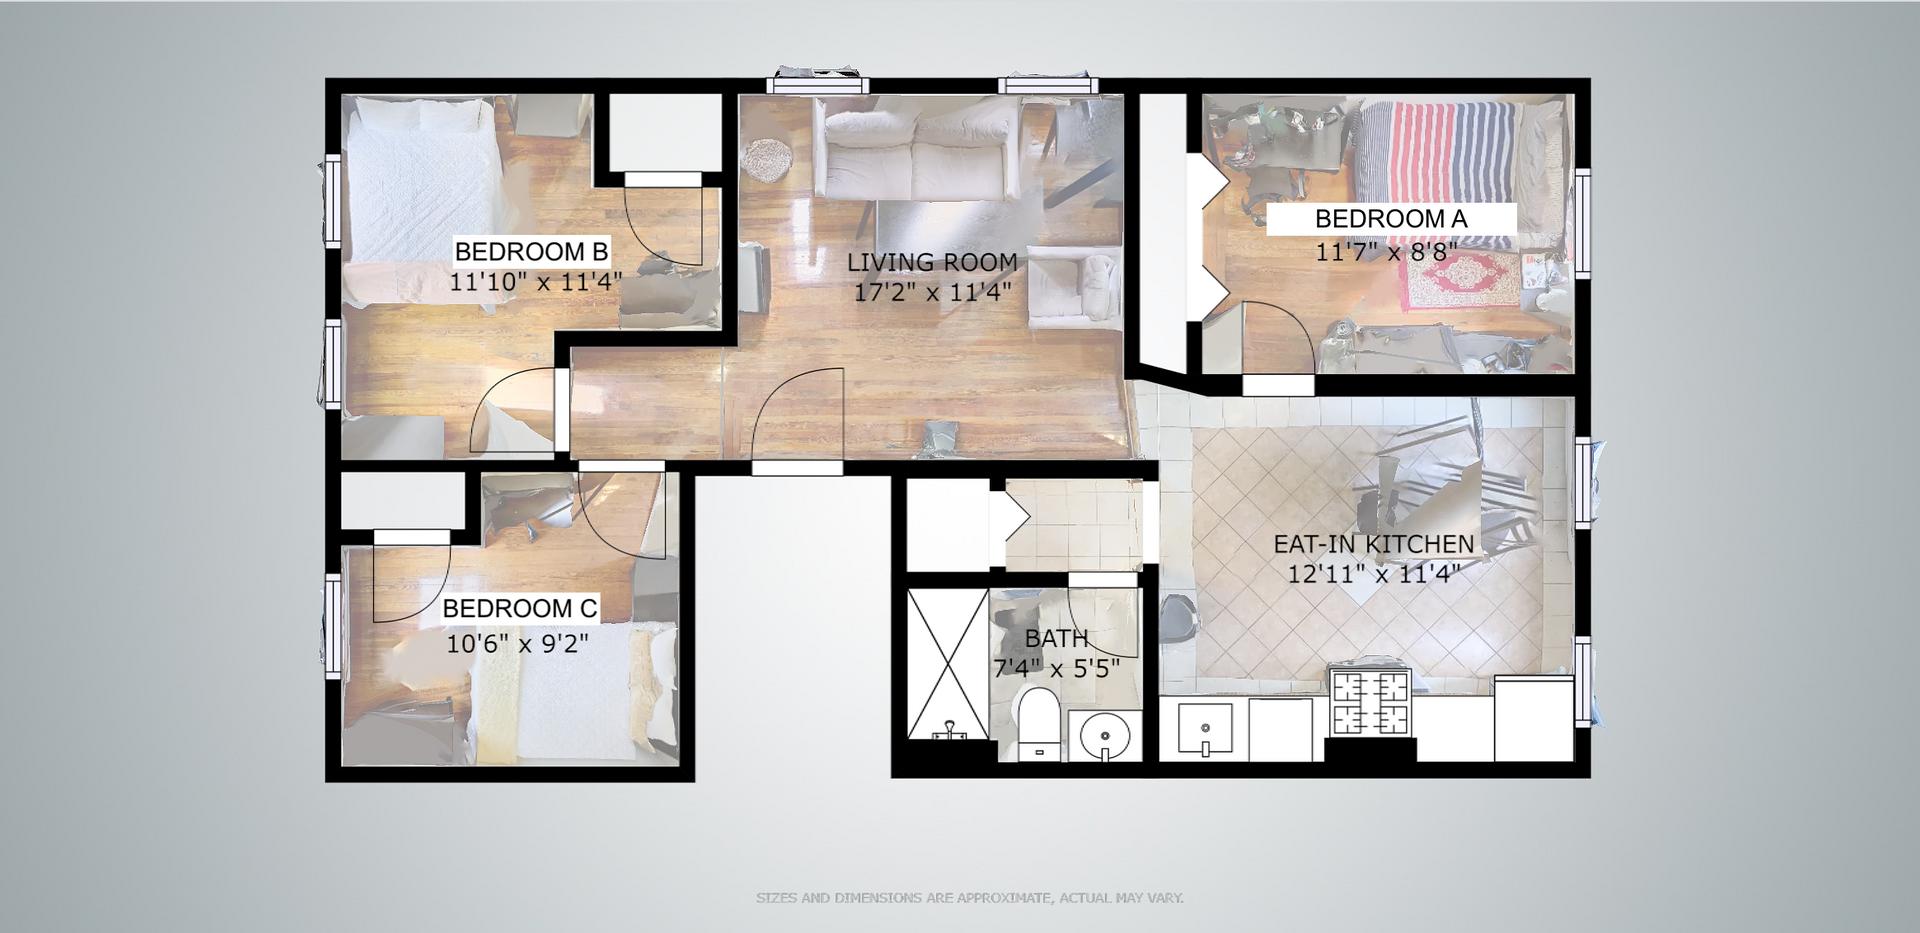 Floorplan of 32 Shelby Unit 2